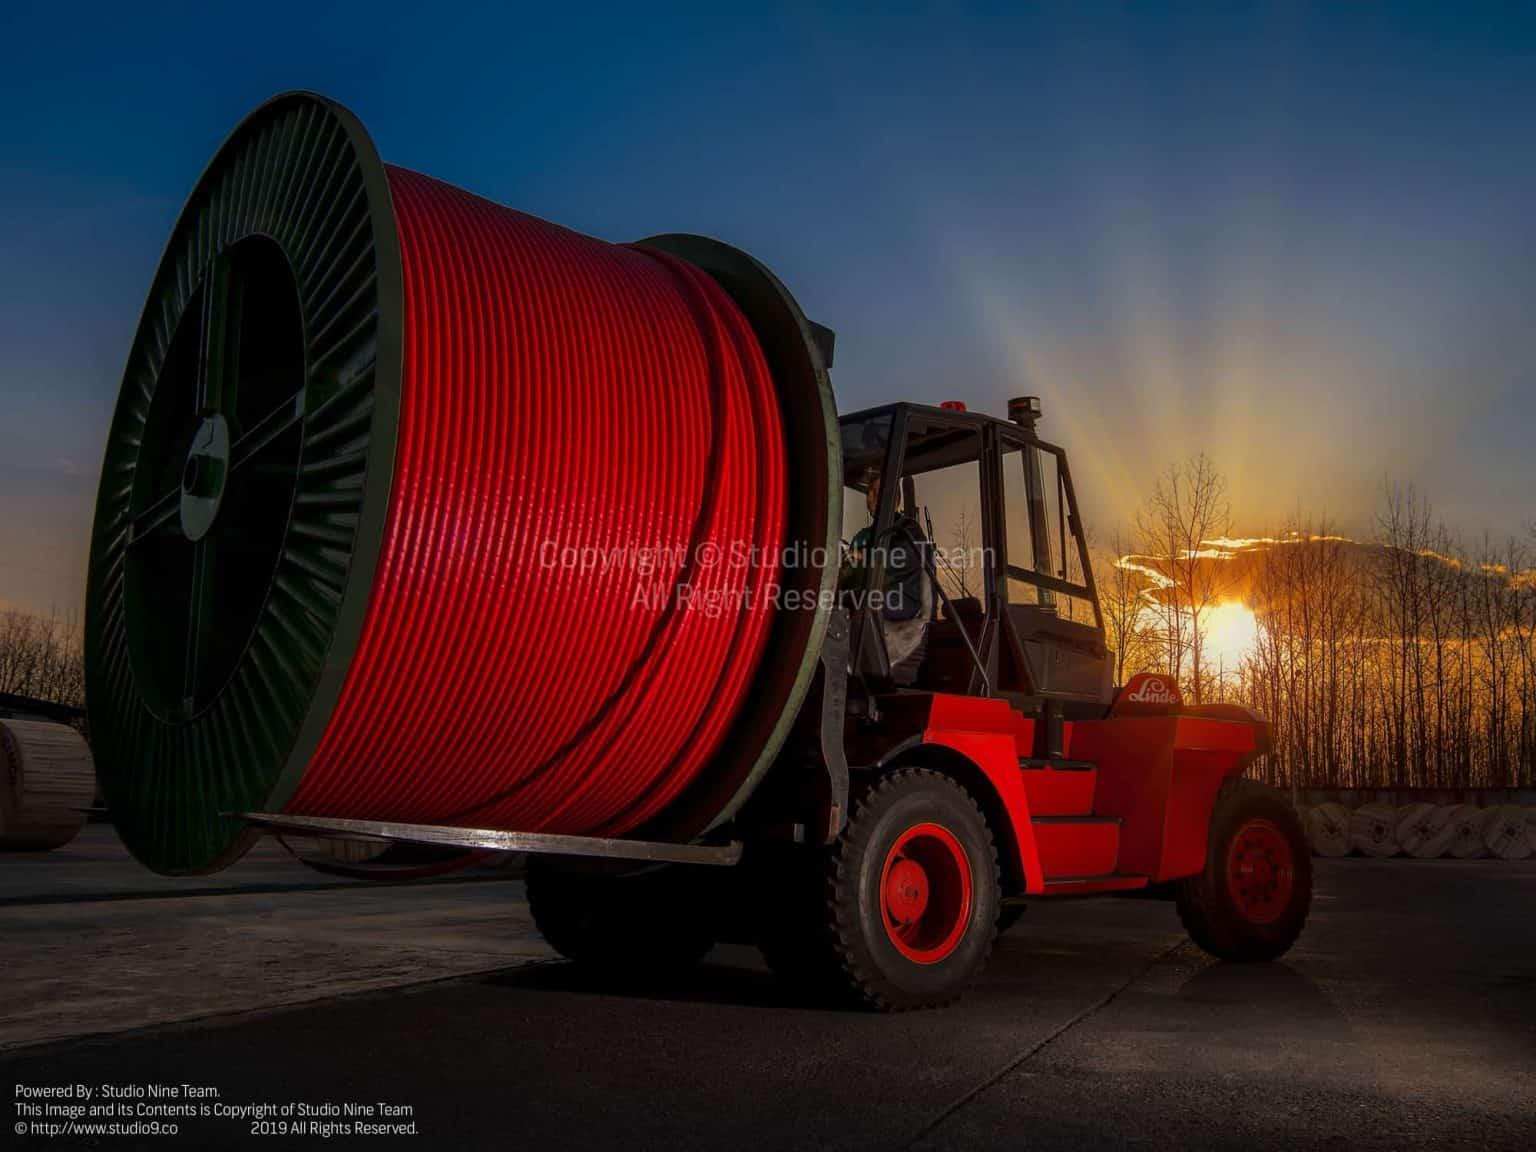 عکاسی خط تولید | عکاسی تبلیغاتی | عکاسی صنعتی از محیط کارخانه سیمکو